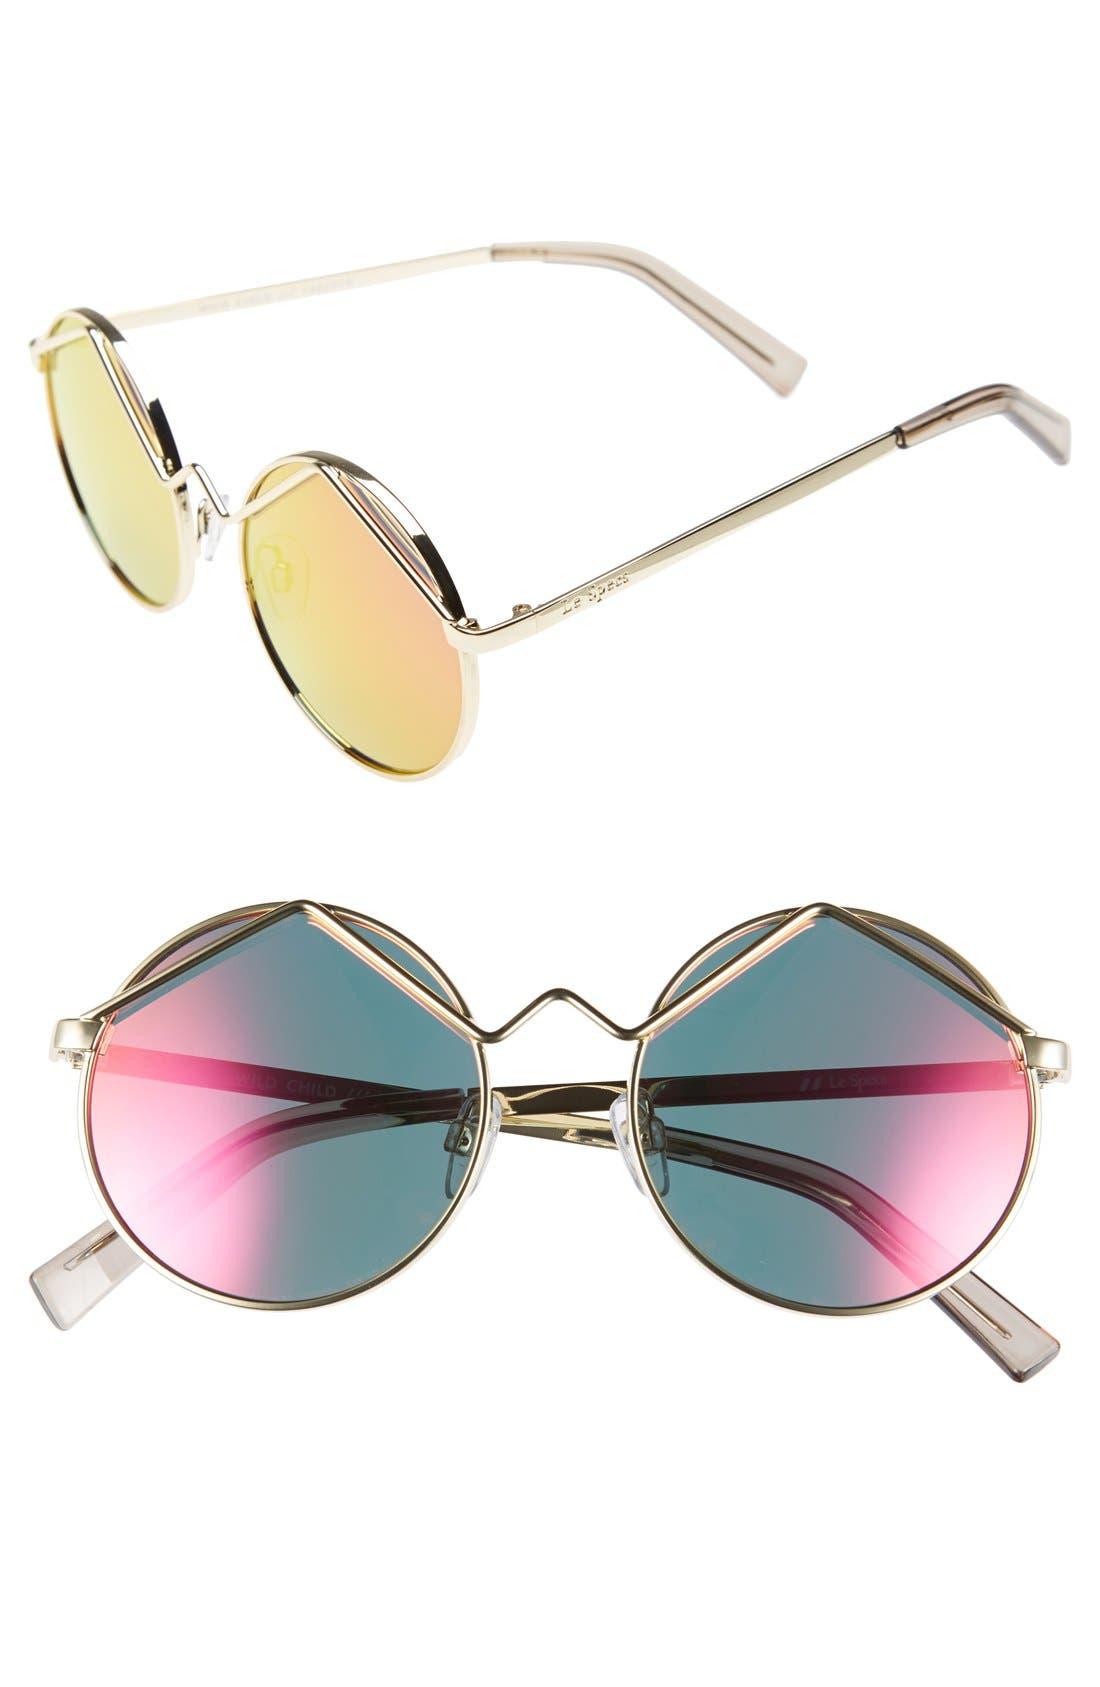 Main Image - Le Specs 'Wild Child' 52mm Sunglasses